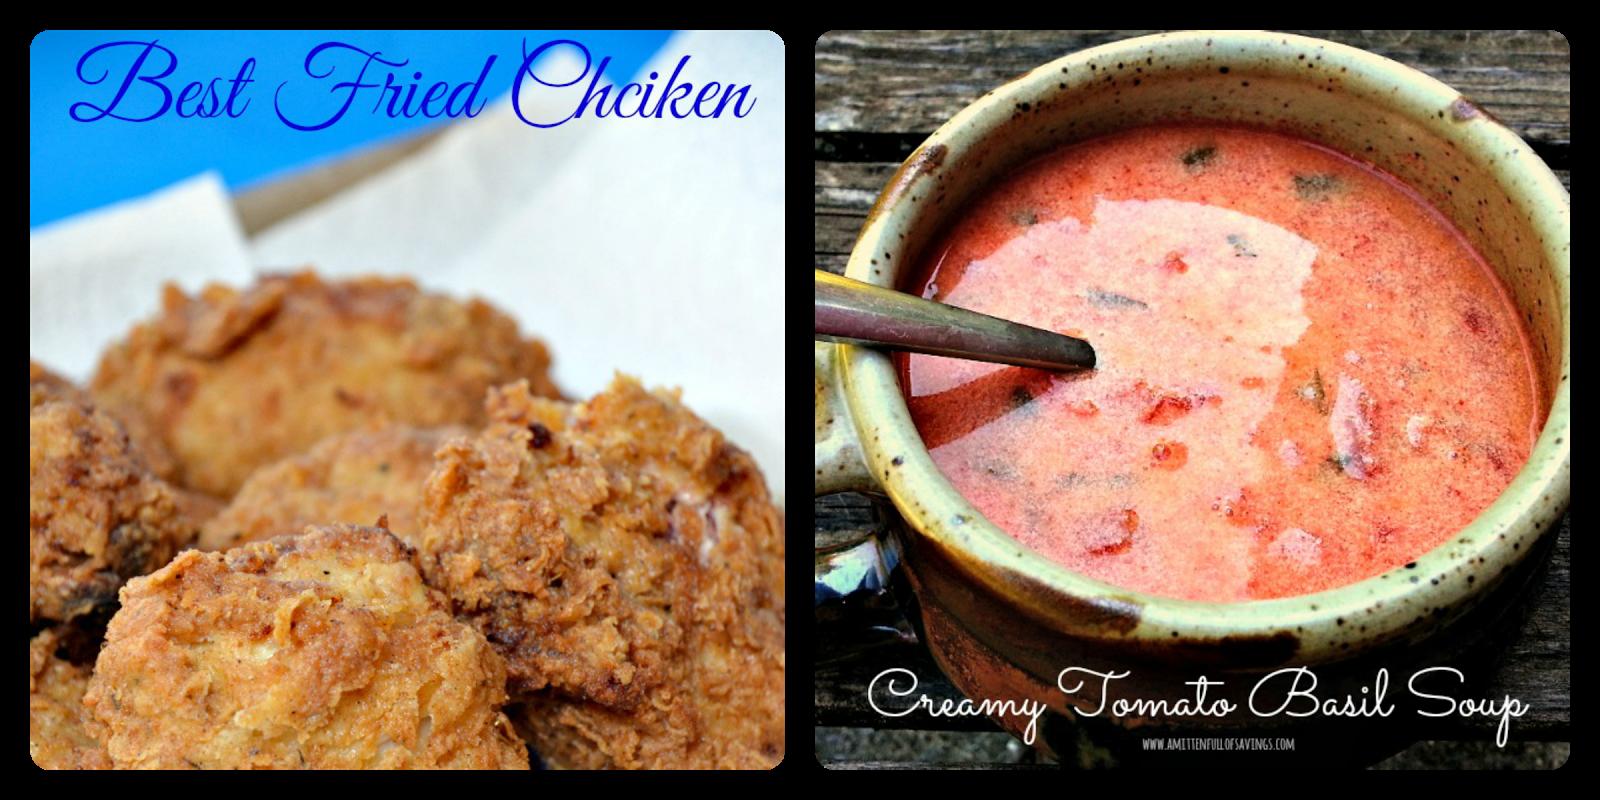 fried chicken, tomato basil soup